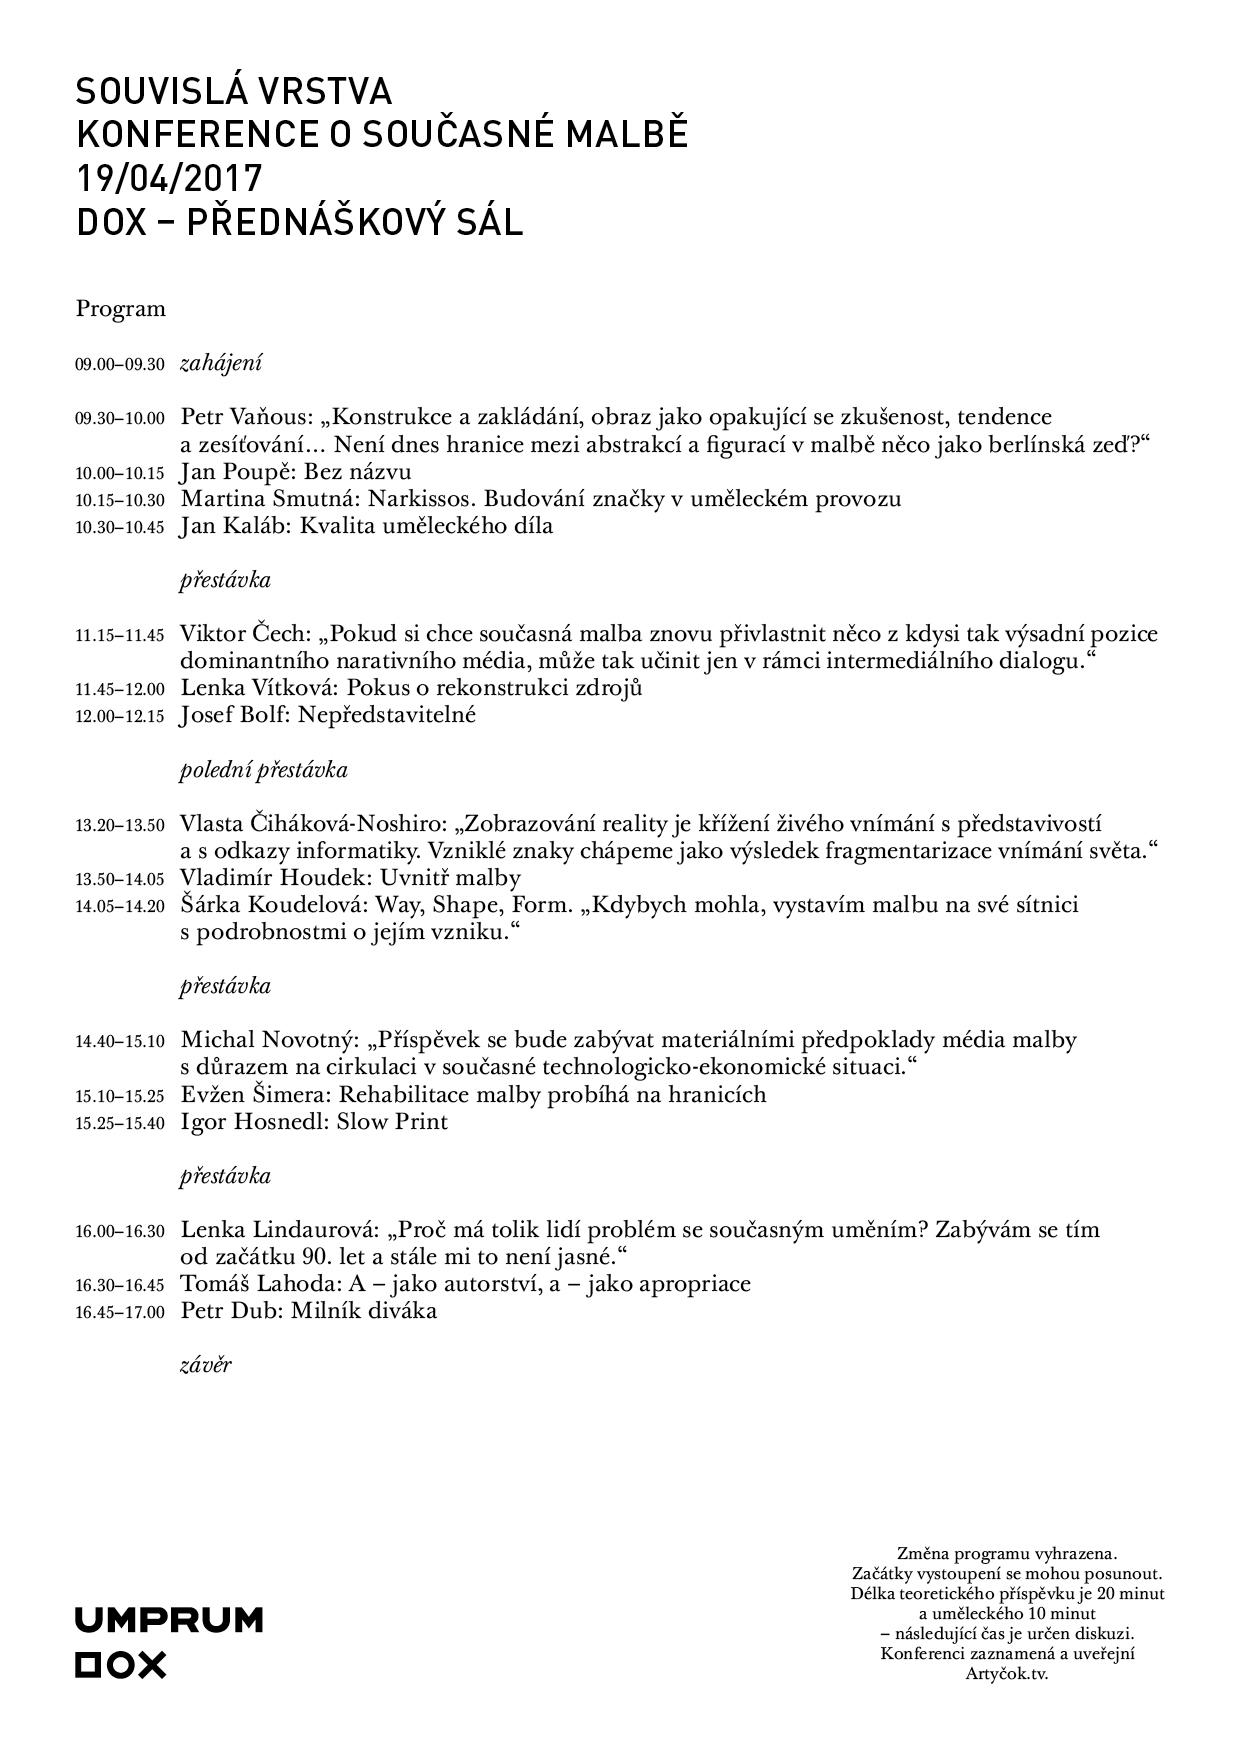 SouvislaVrstvaProgram.jpg